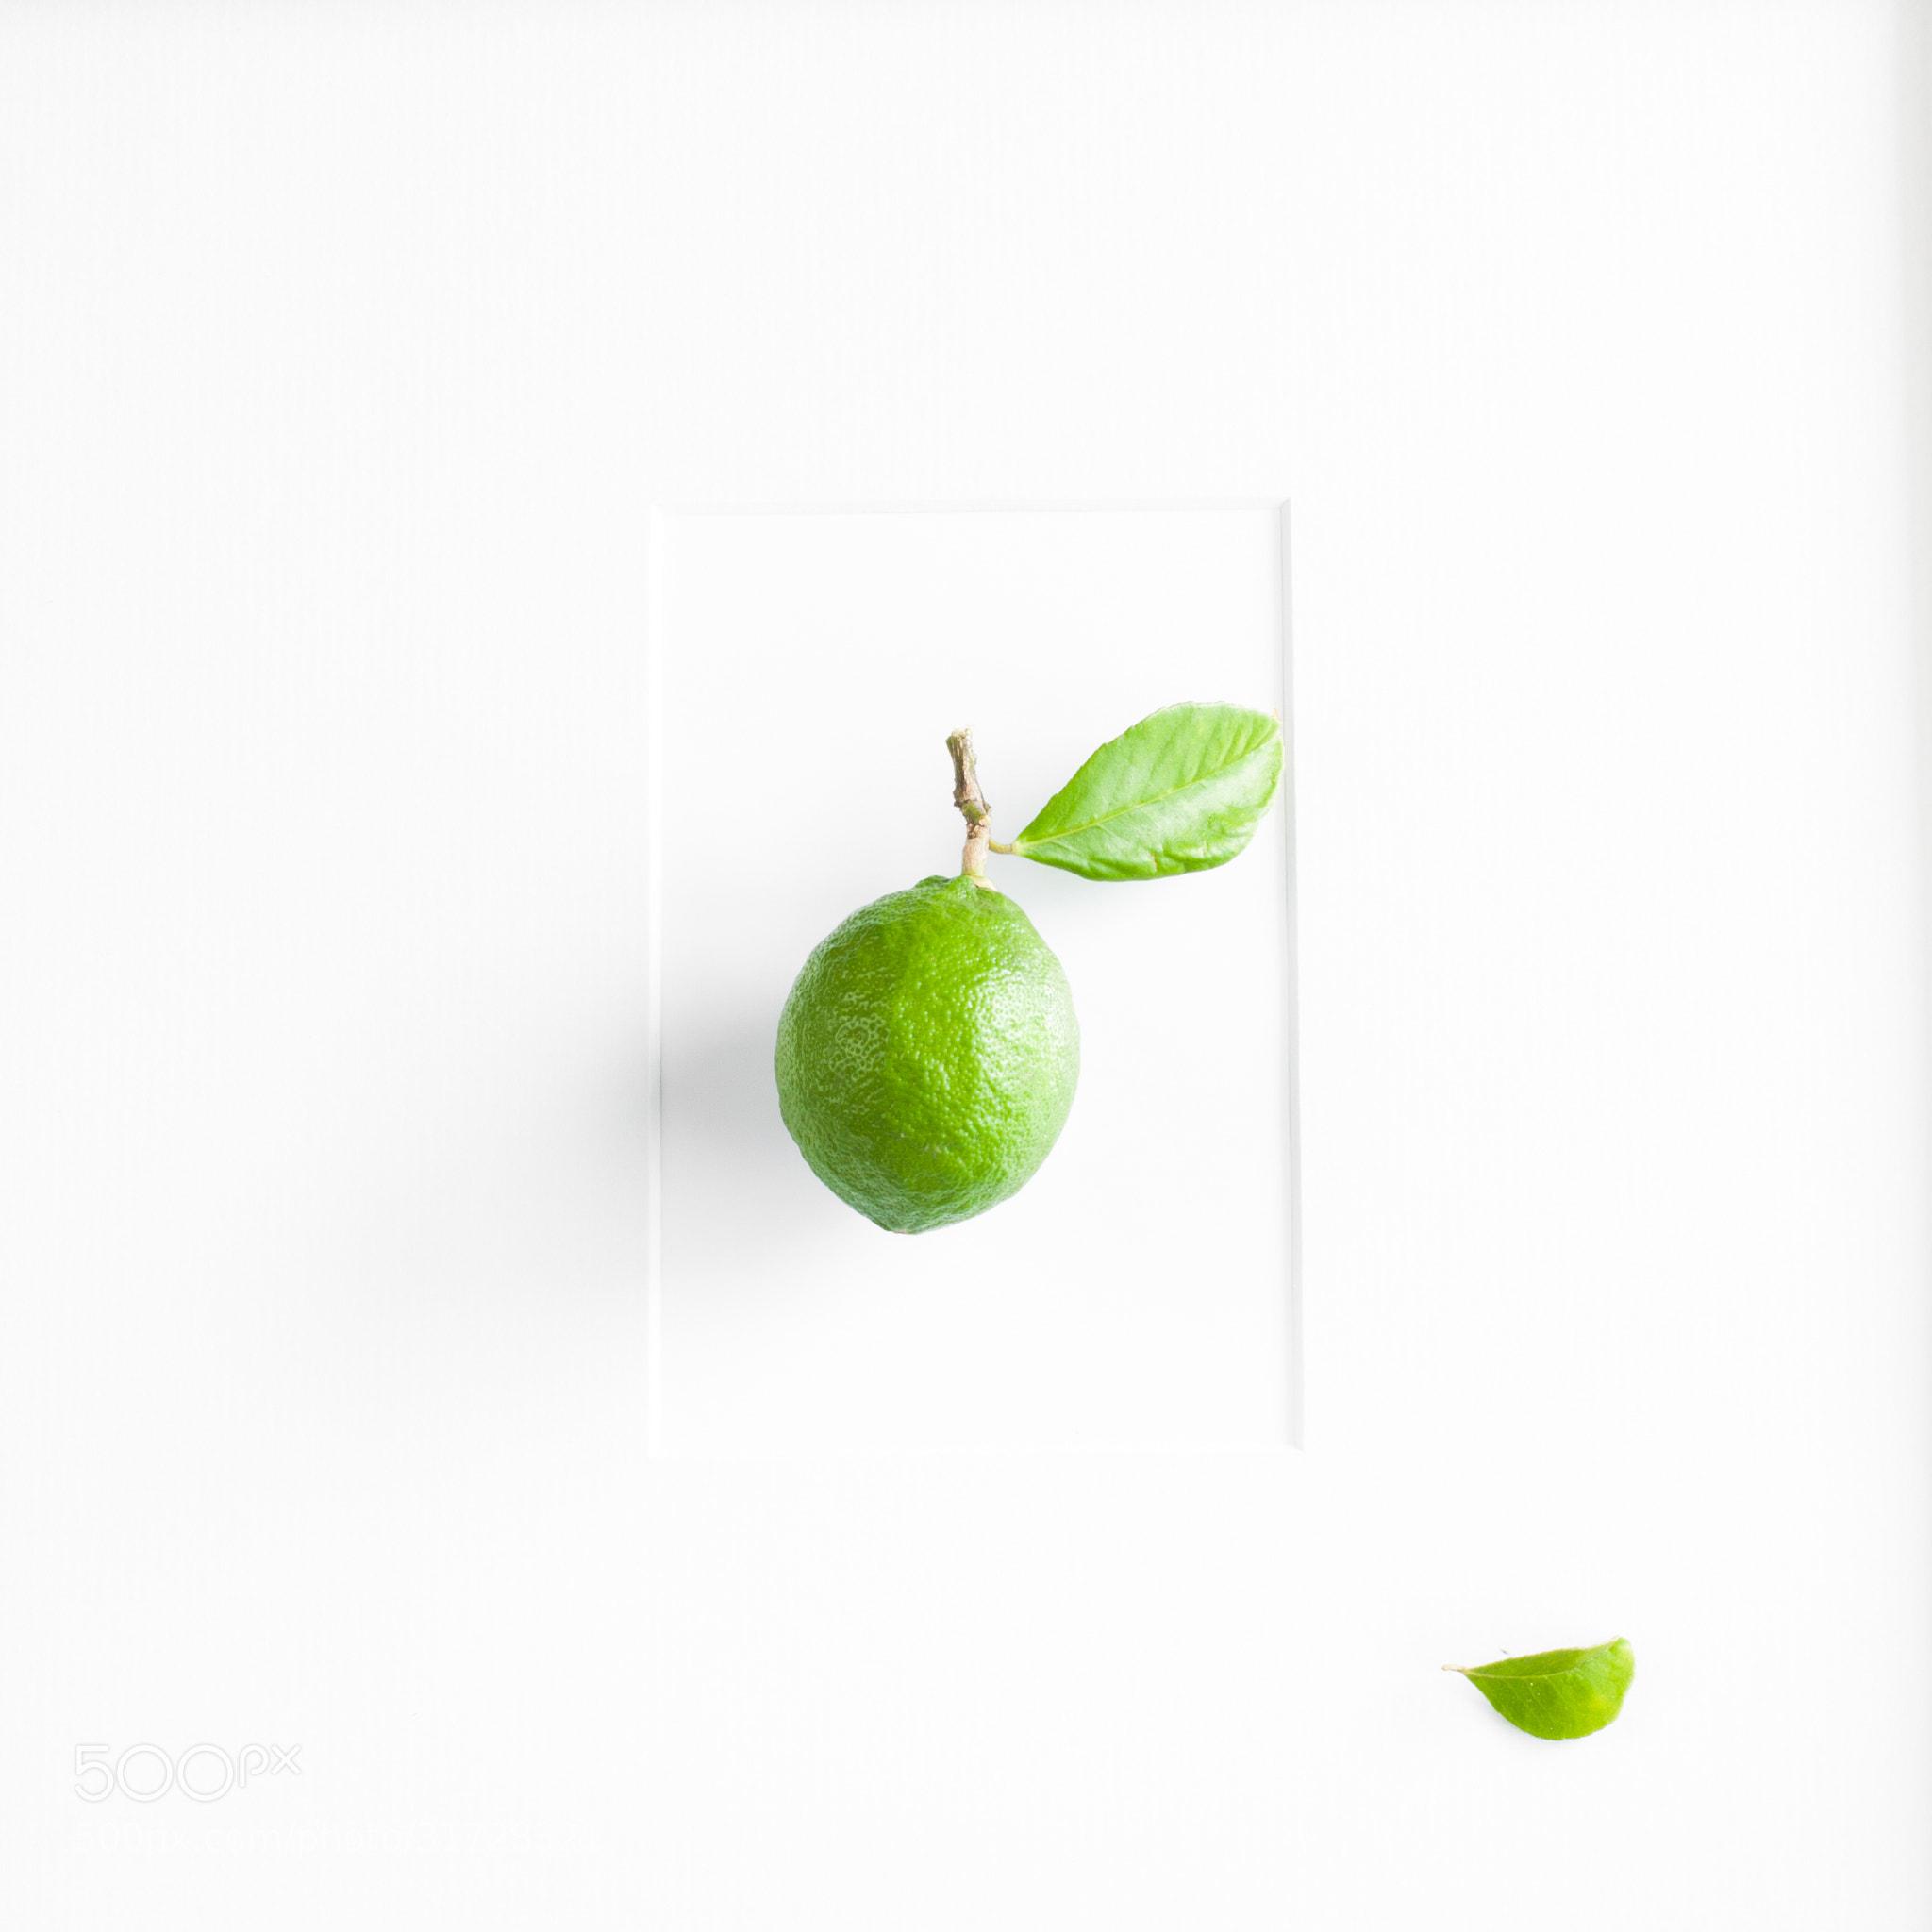 Photograph A Green Lemon - Framed by Constance Fein Harding on 500px